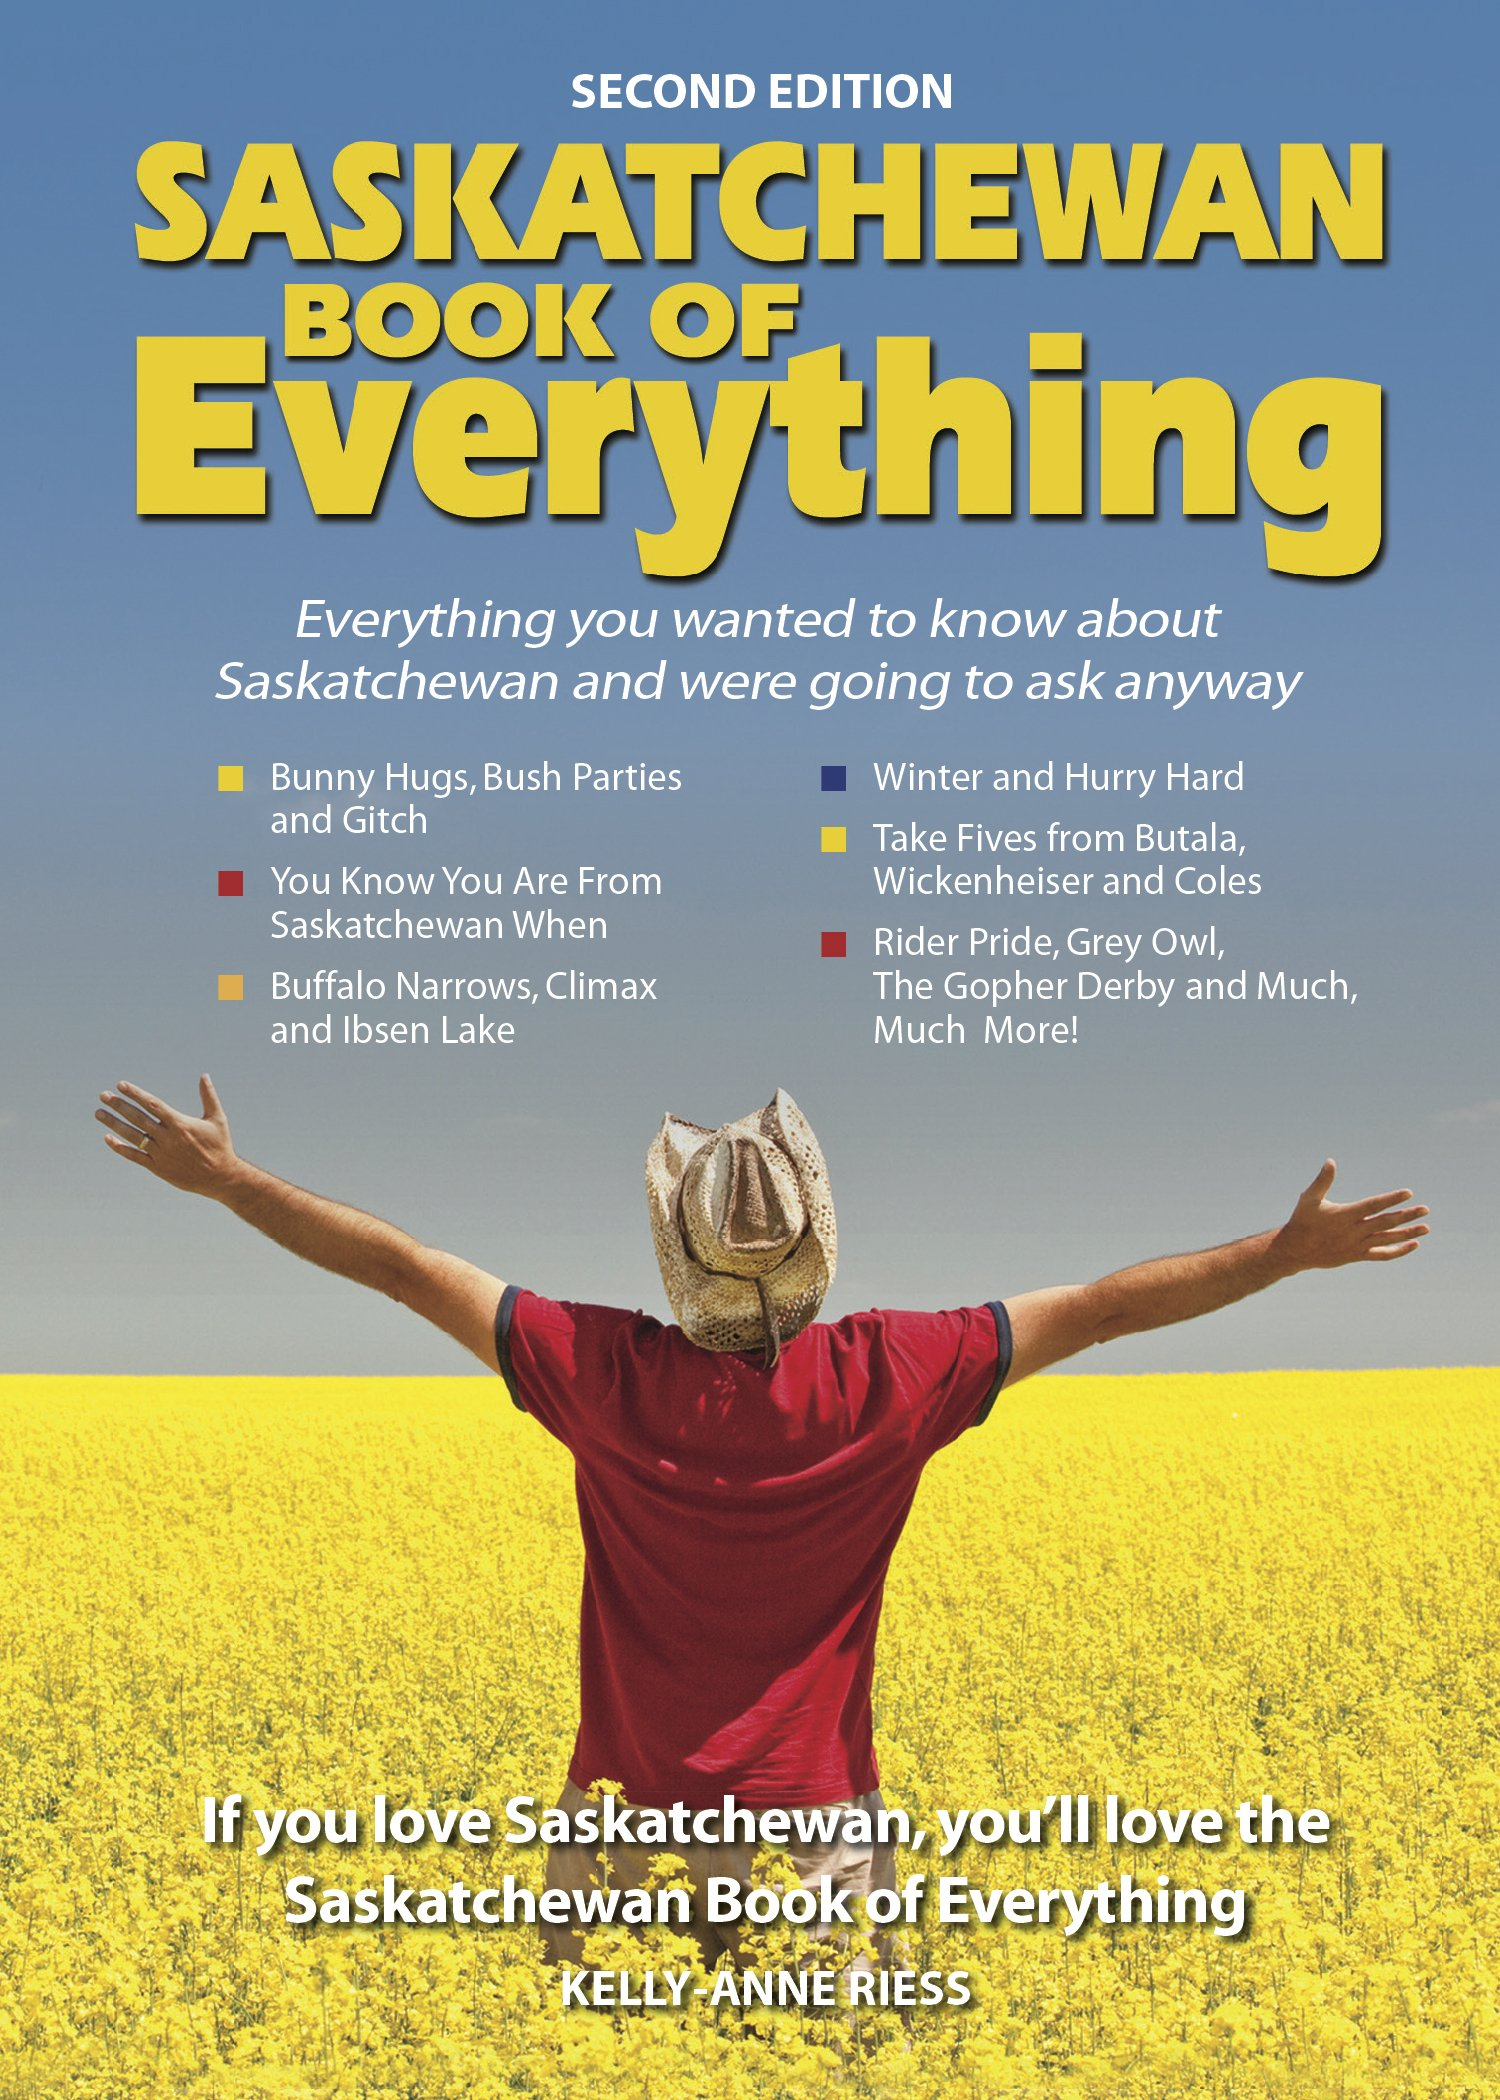 Saskatchewan Book of Everything Vol. 2